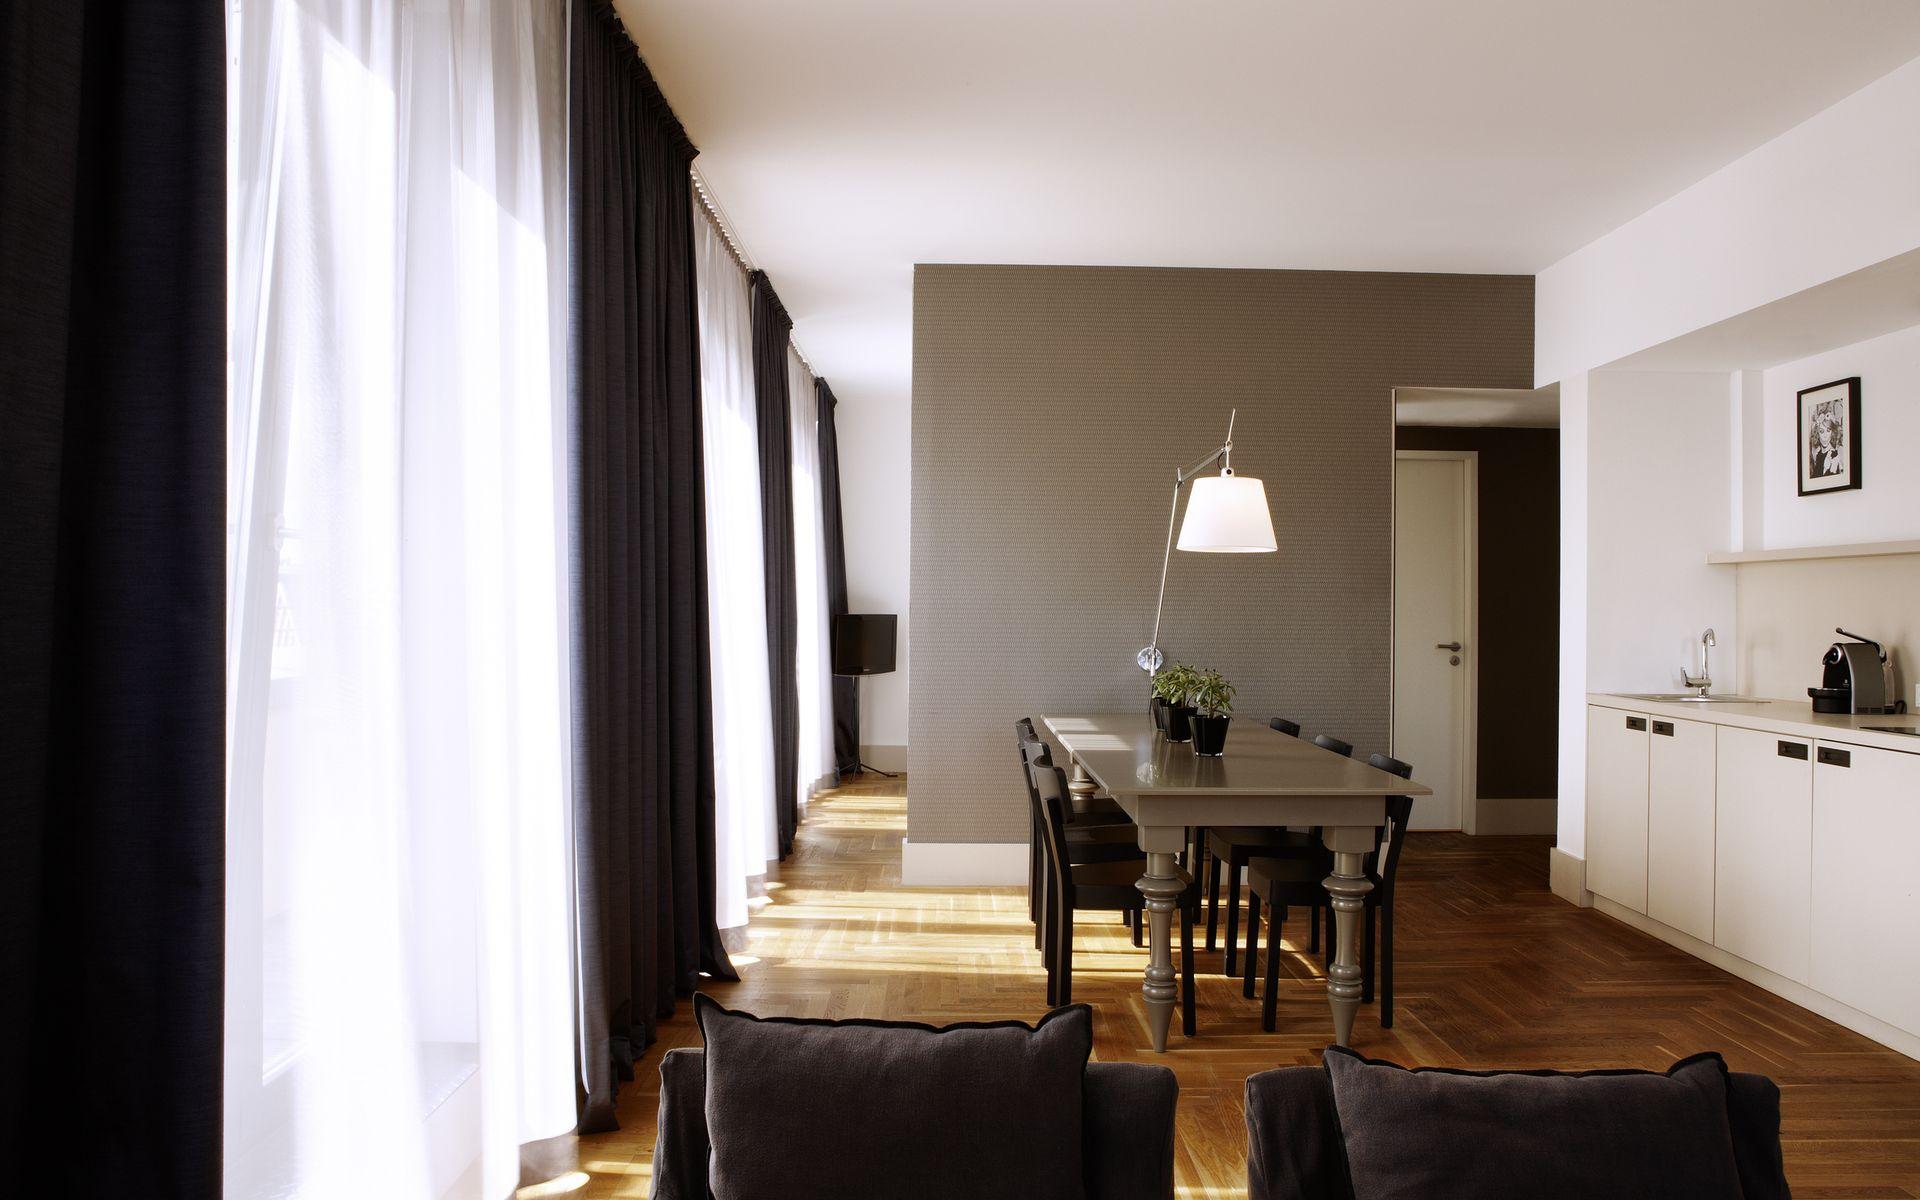 Hotel amano berlin logitravel - Television pequena plana ...